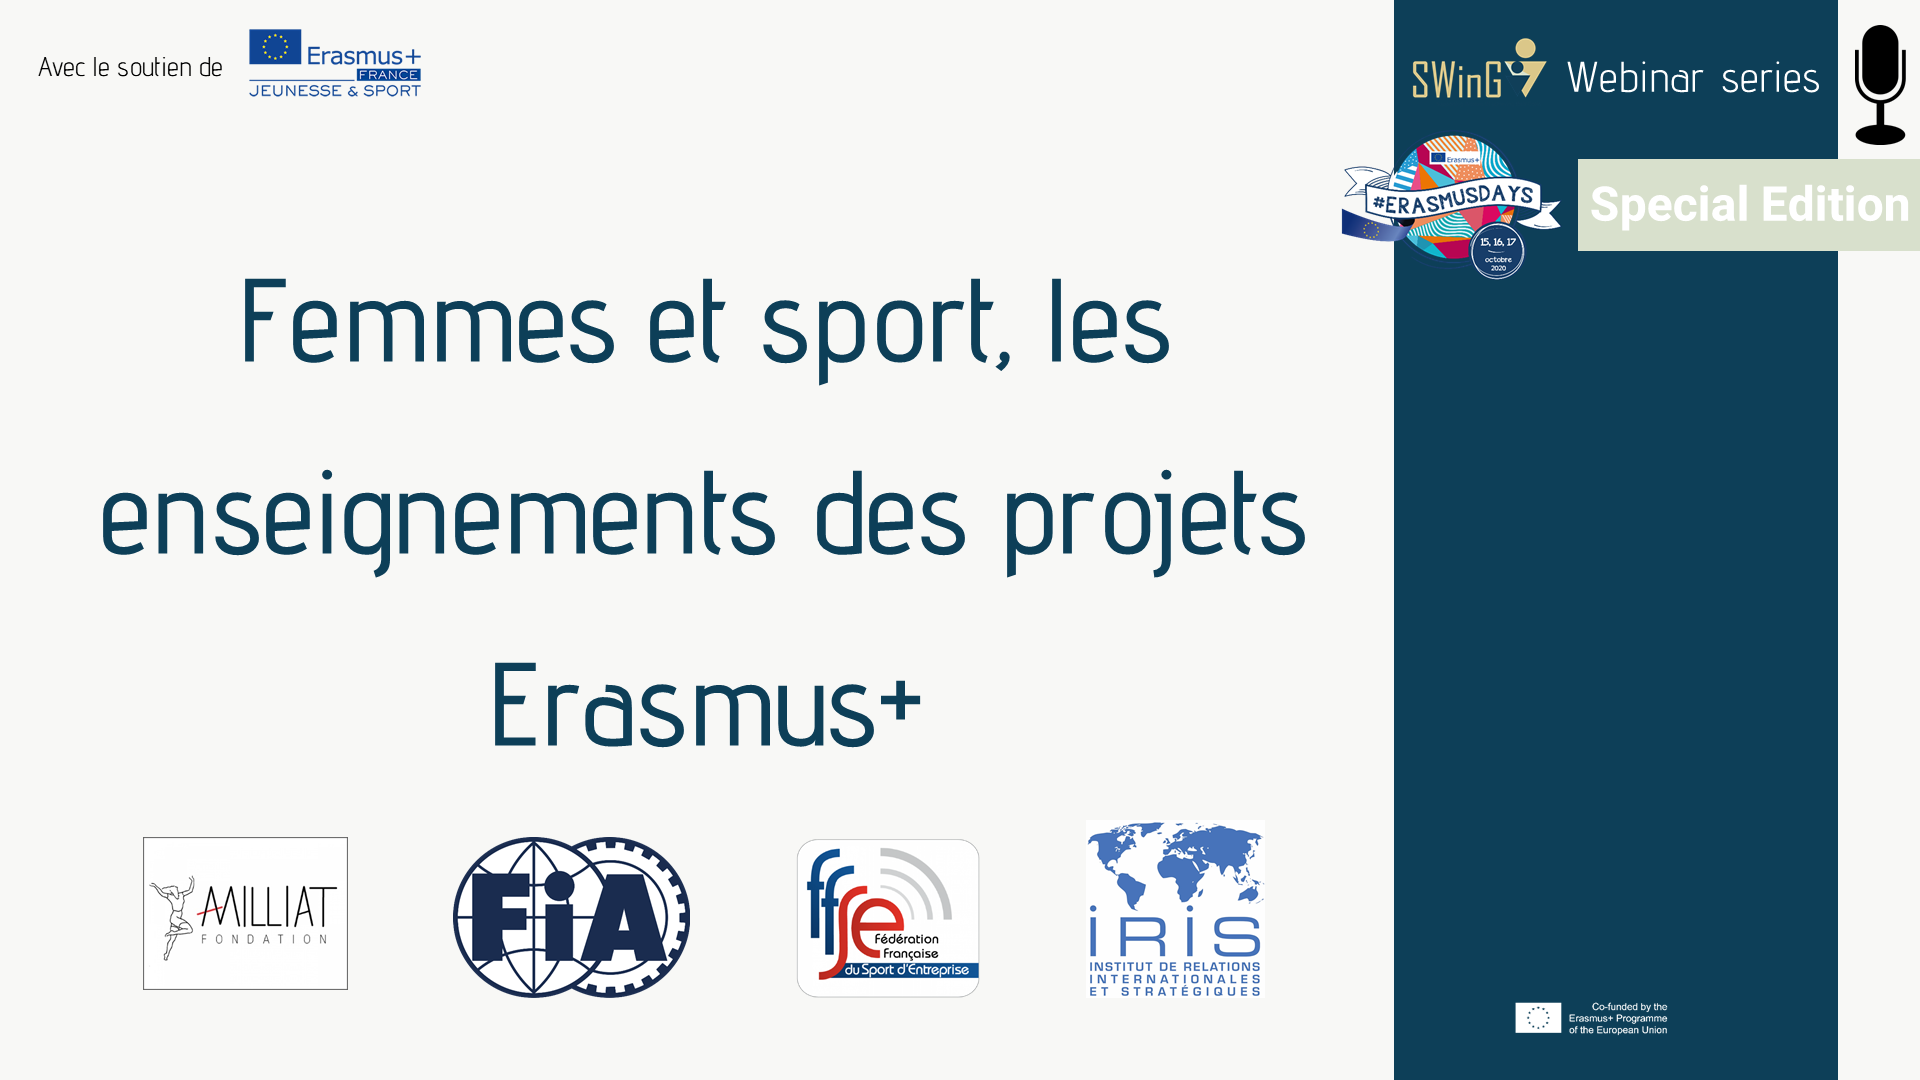 ErasmusDays femmes et sport